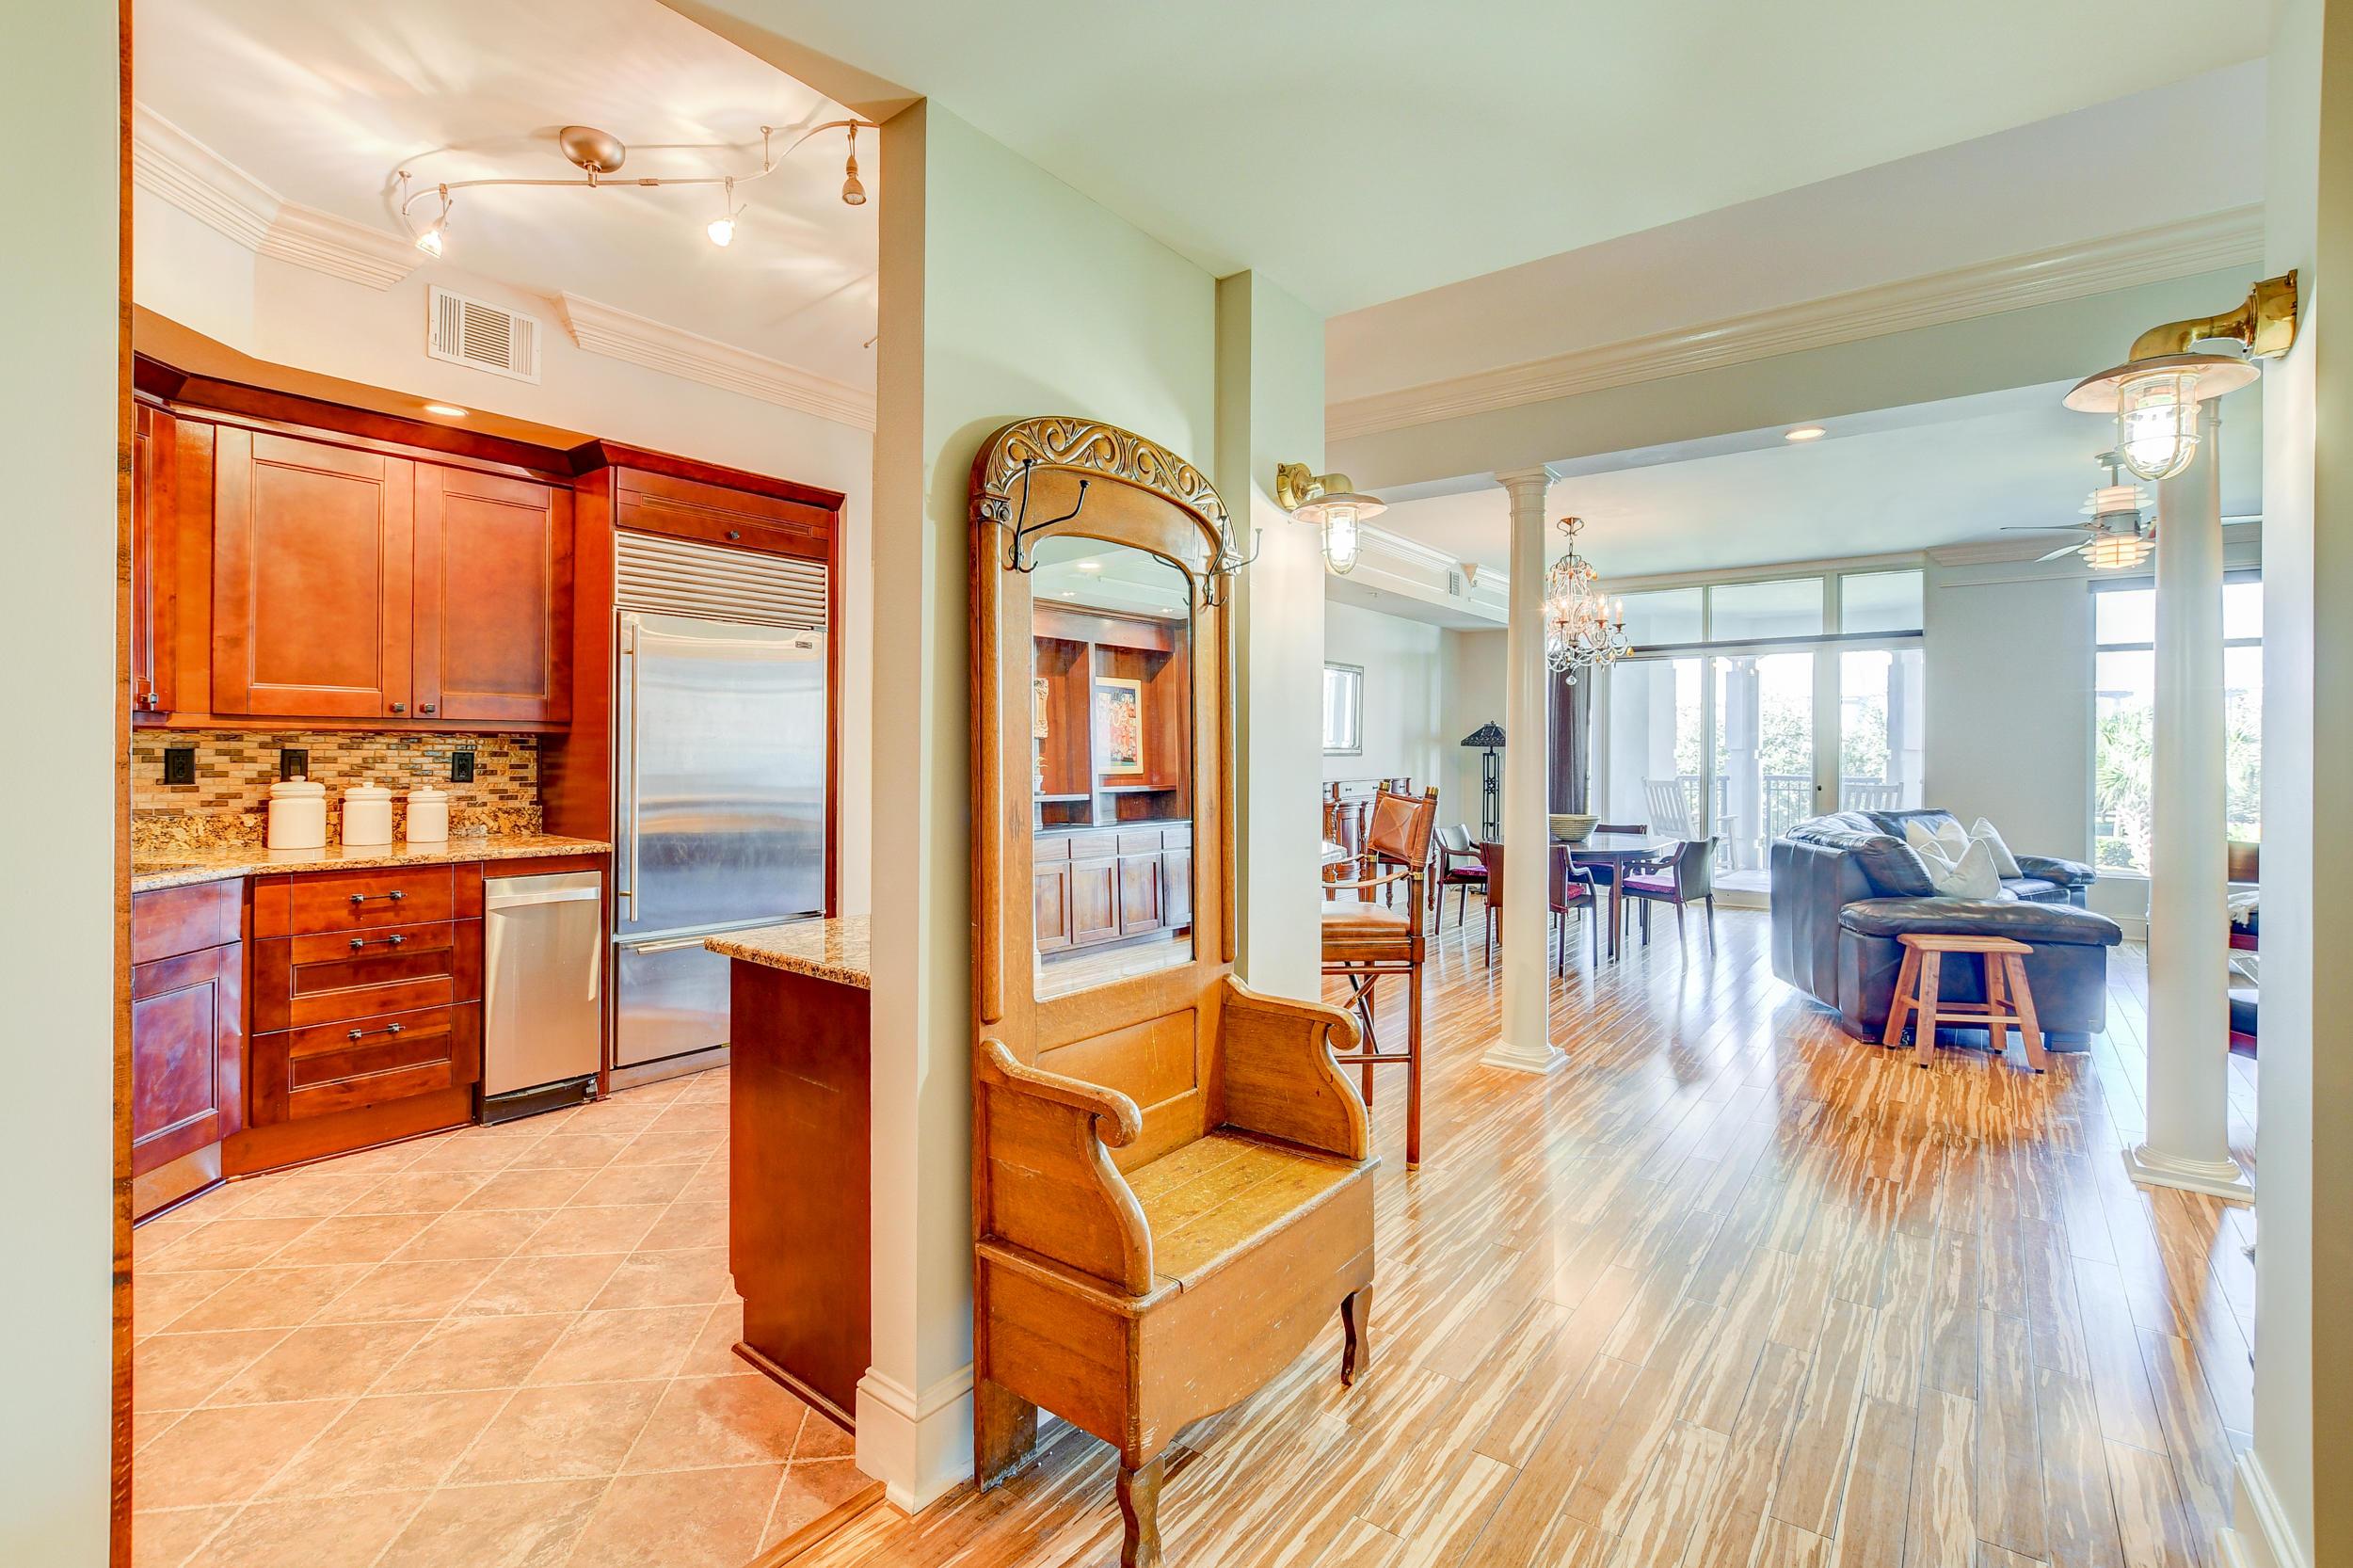 Renaissance On Chas Harbor Homes For Sale - 224 Plaza, Mount Pleasant, SC - 34